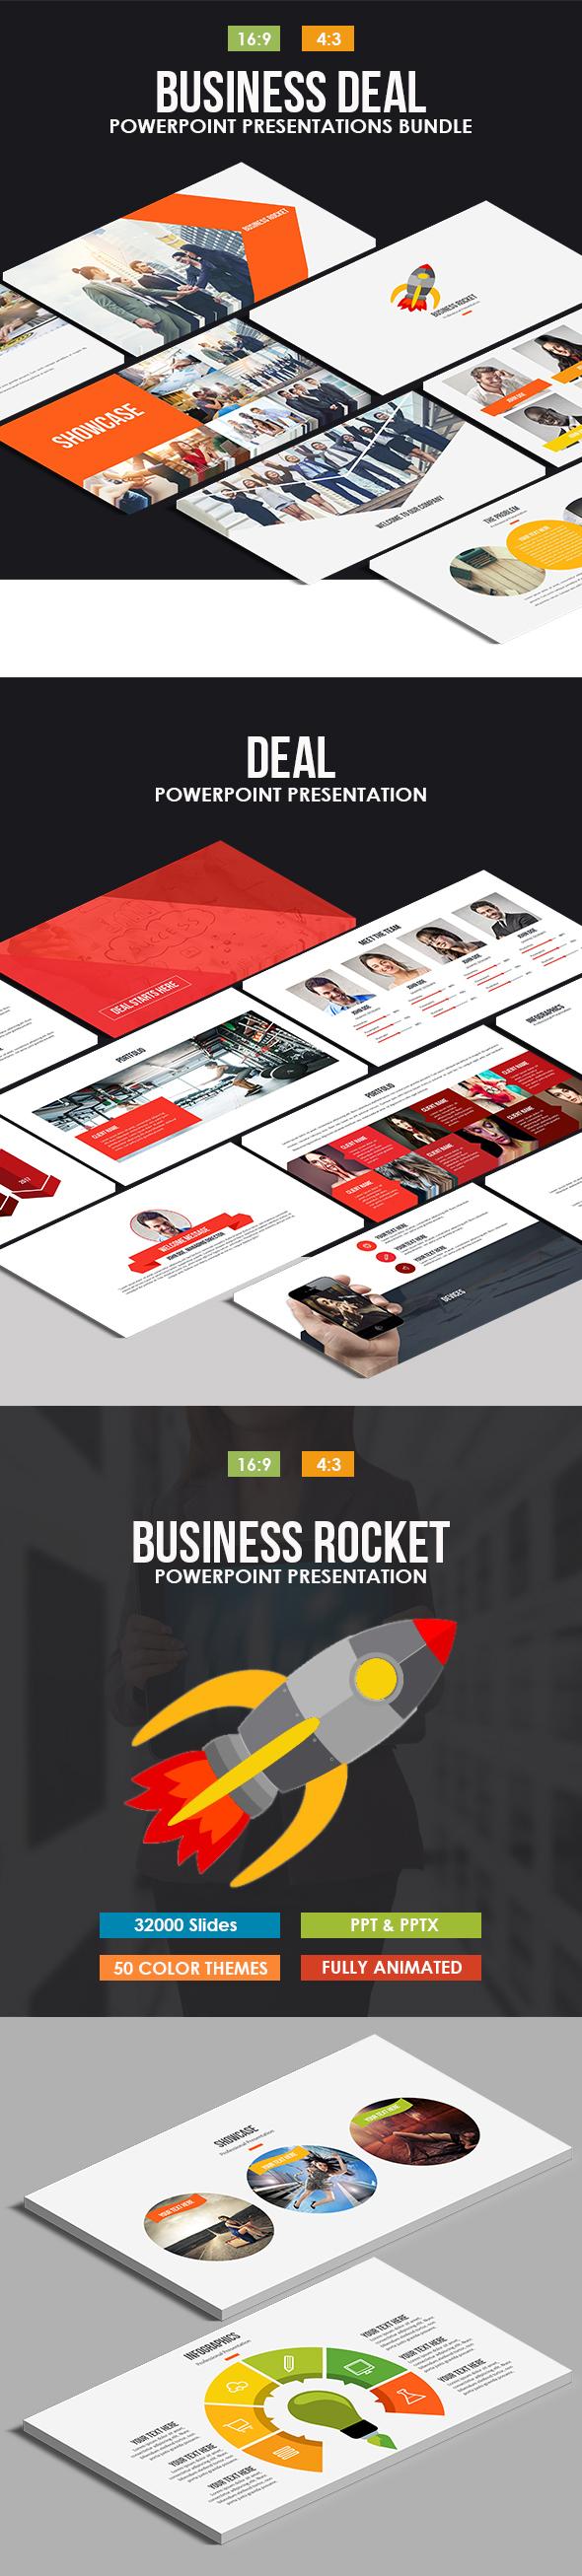 Business Deal Powerpoint Bundle - Business PowerPoint Templates